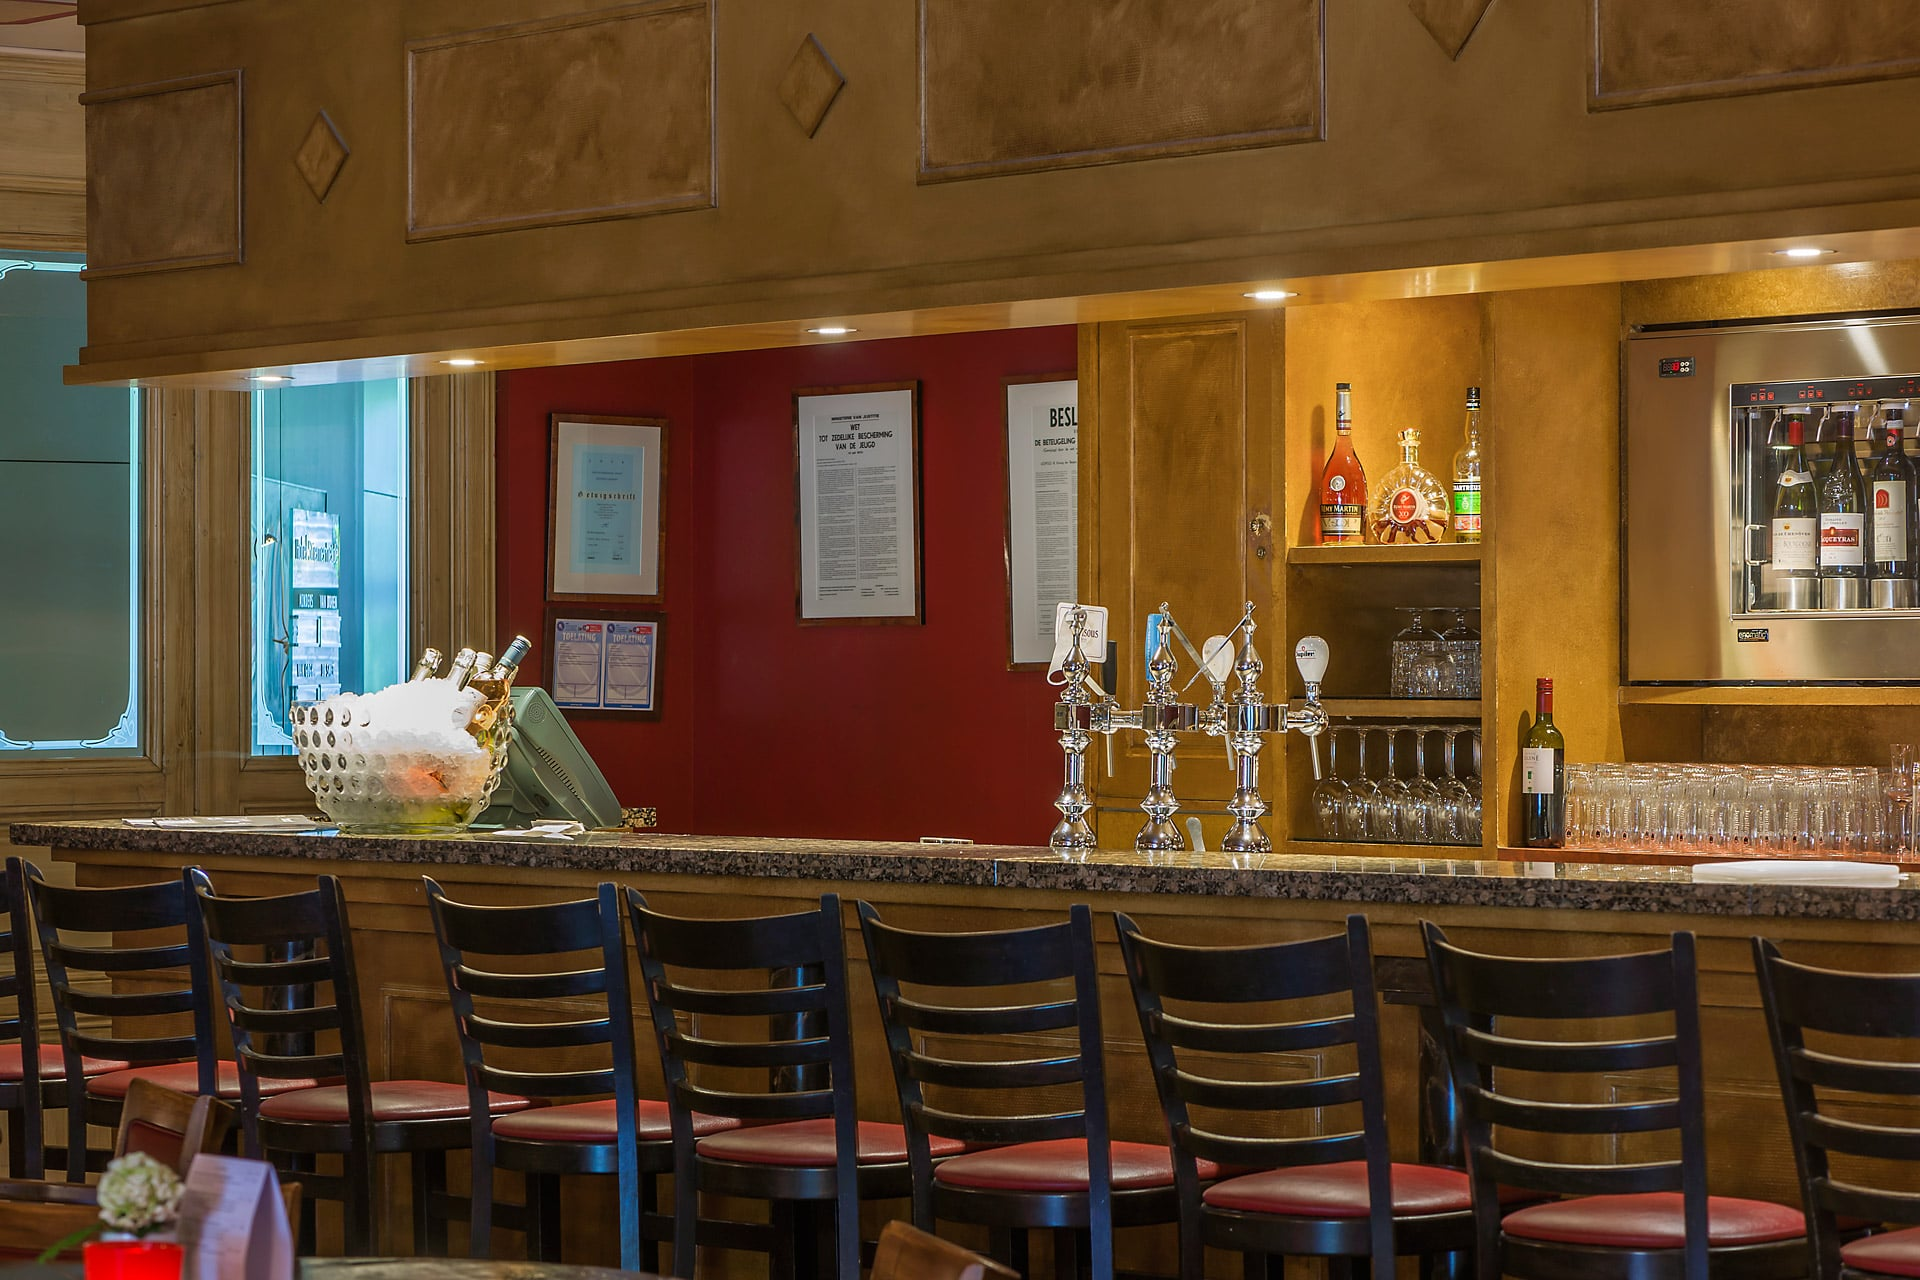 Ervaringen Uniek Keukens Roermond : Lentefeest Roermond Hotel Stiemerheide